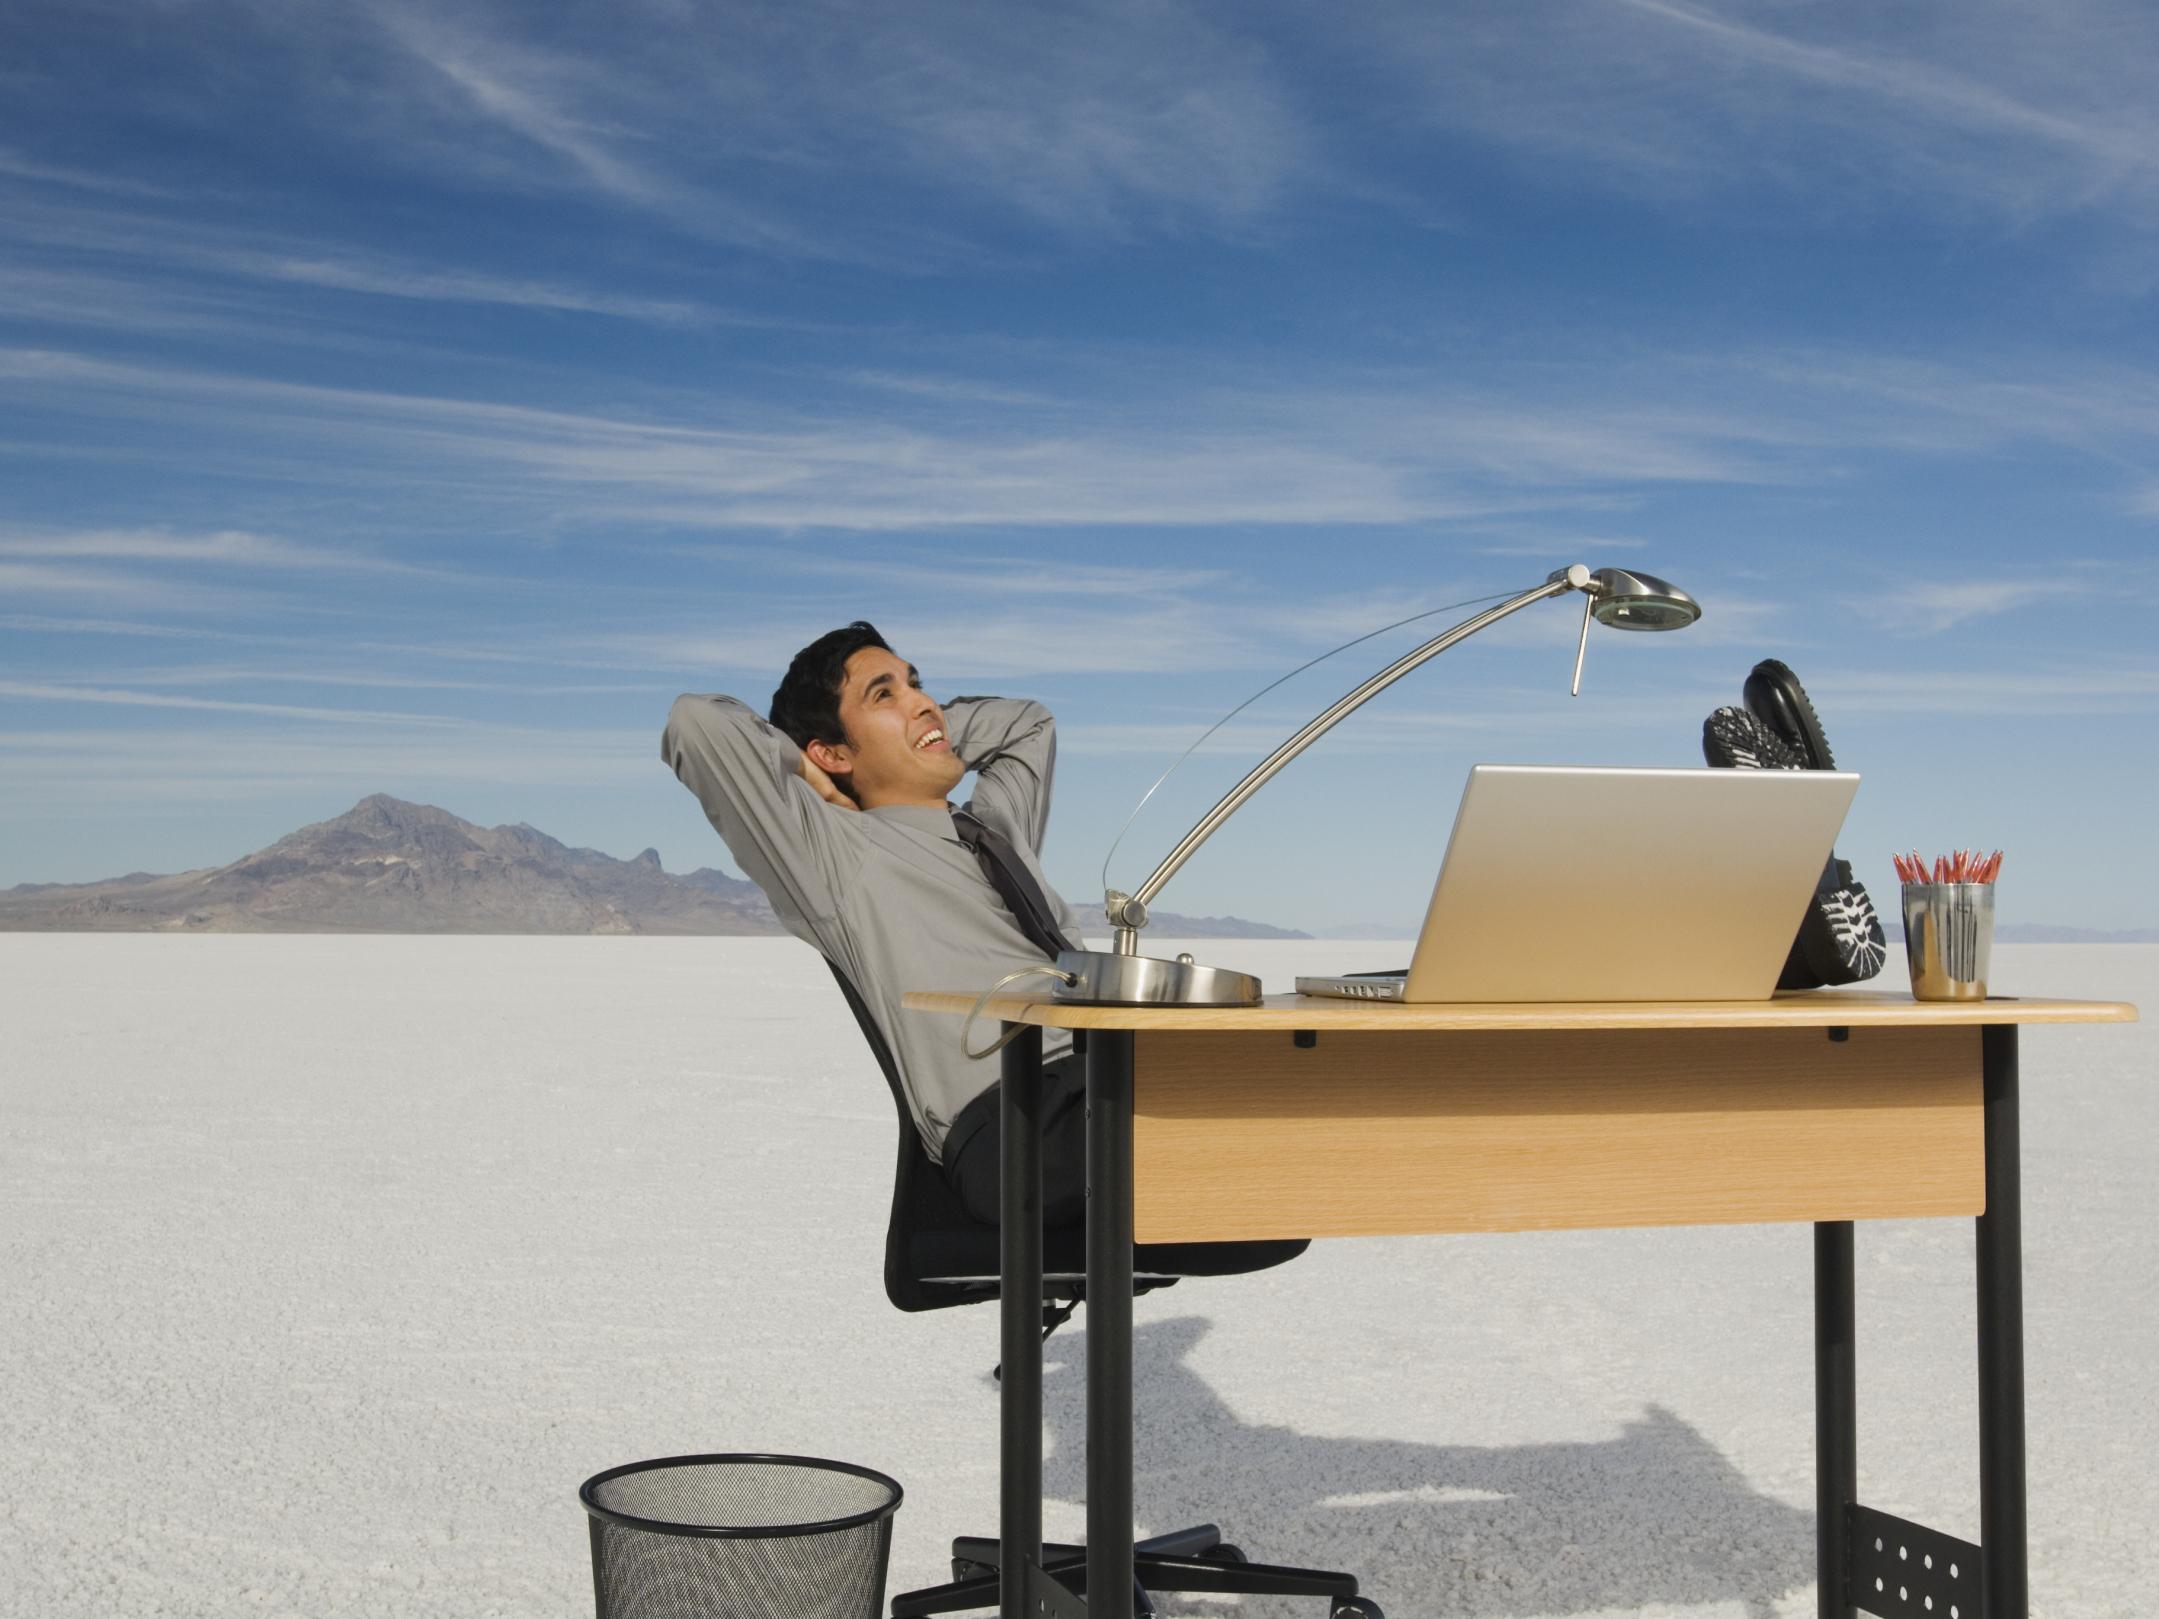 qualities of an ideal job